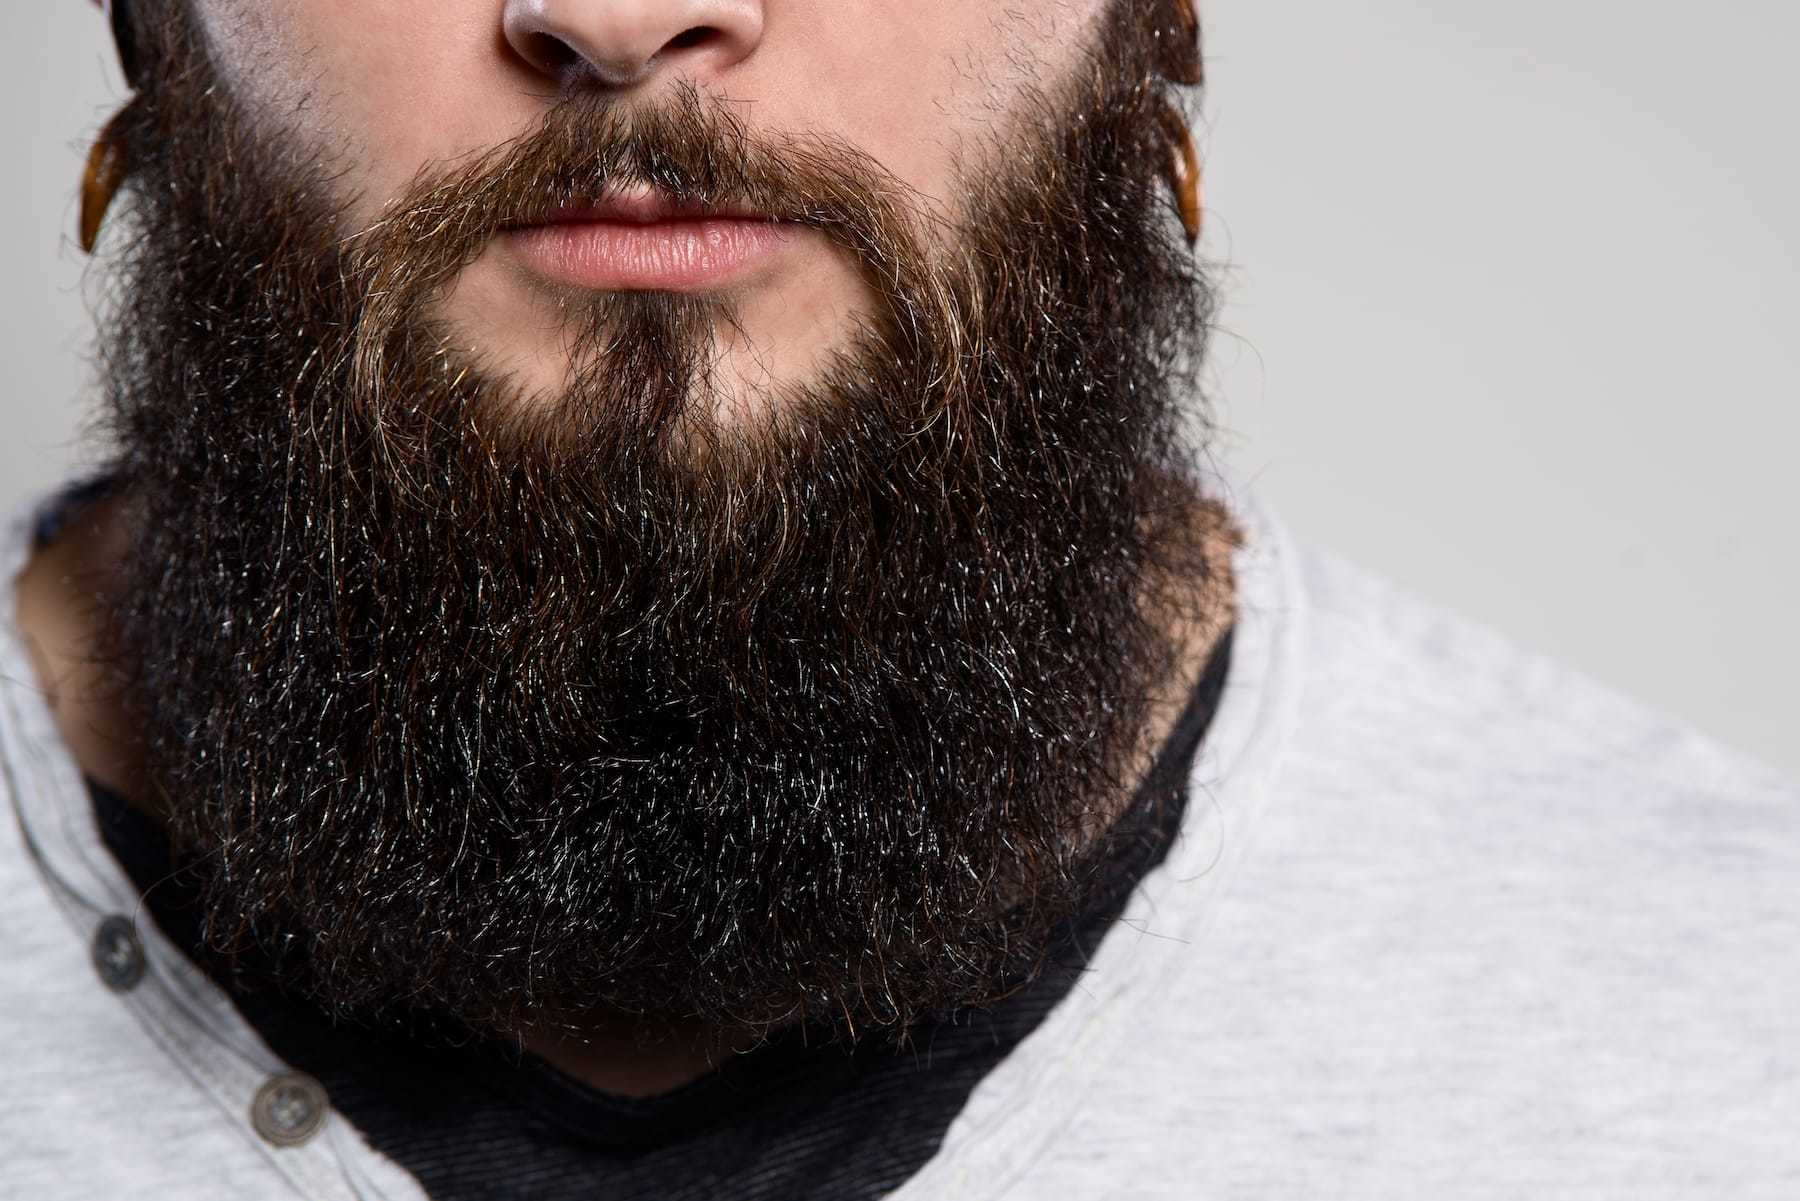 De depois barbear sair evitar